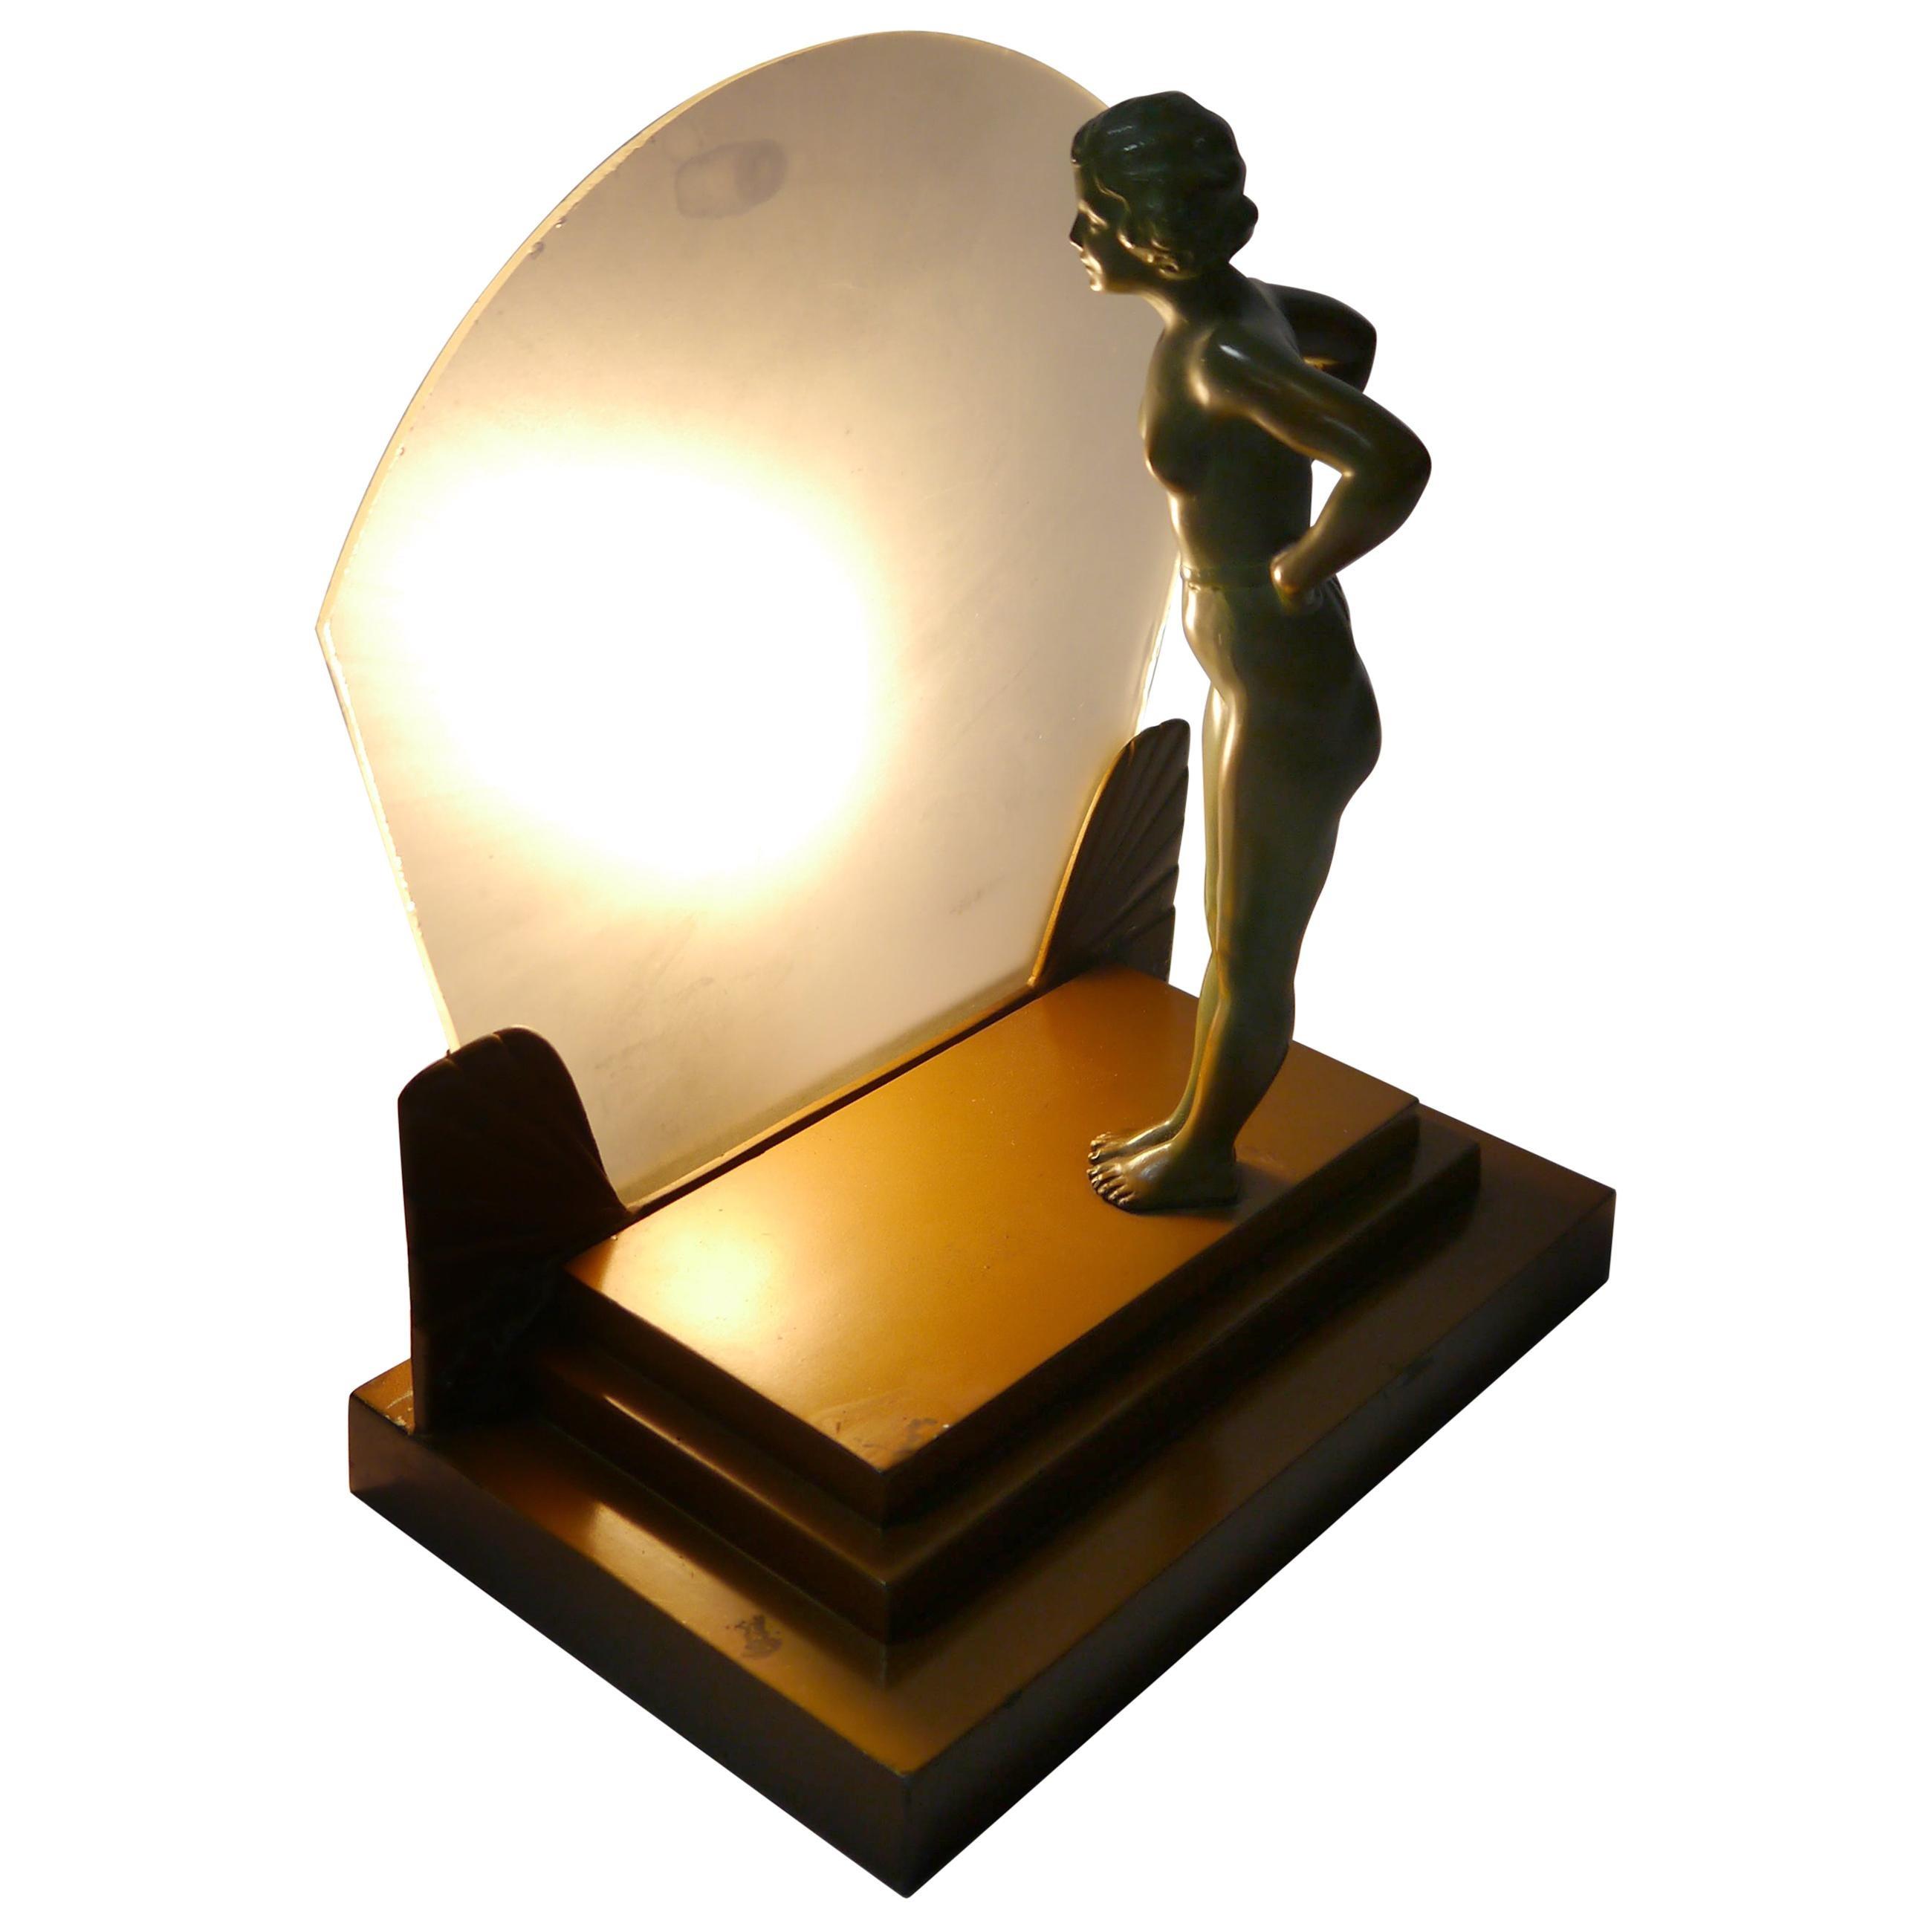 Art Deco Female Figure Table Lamp, 1930s